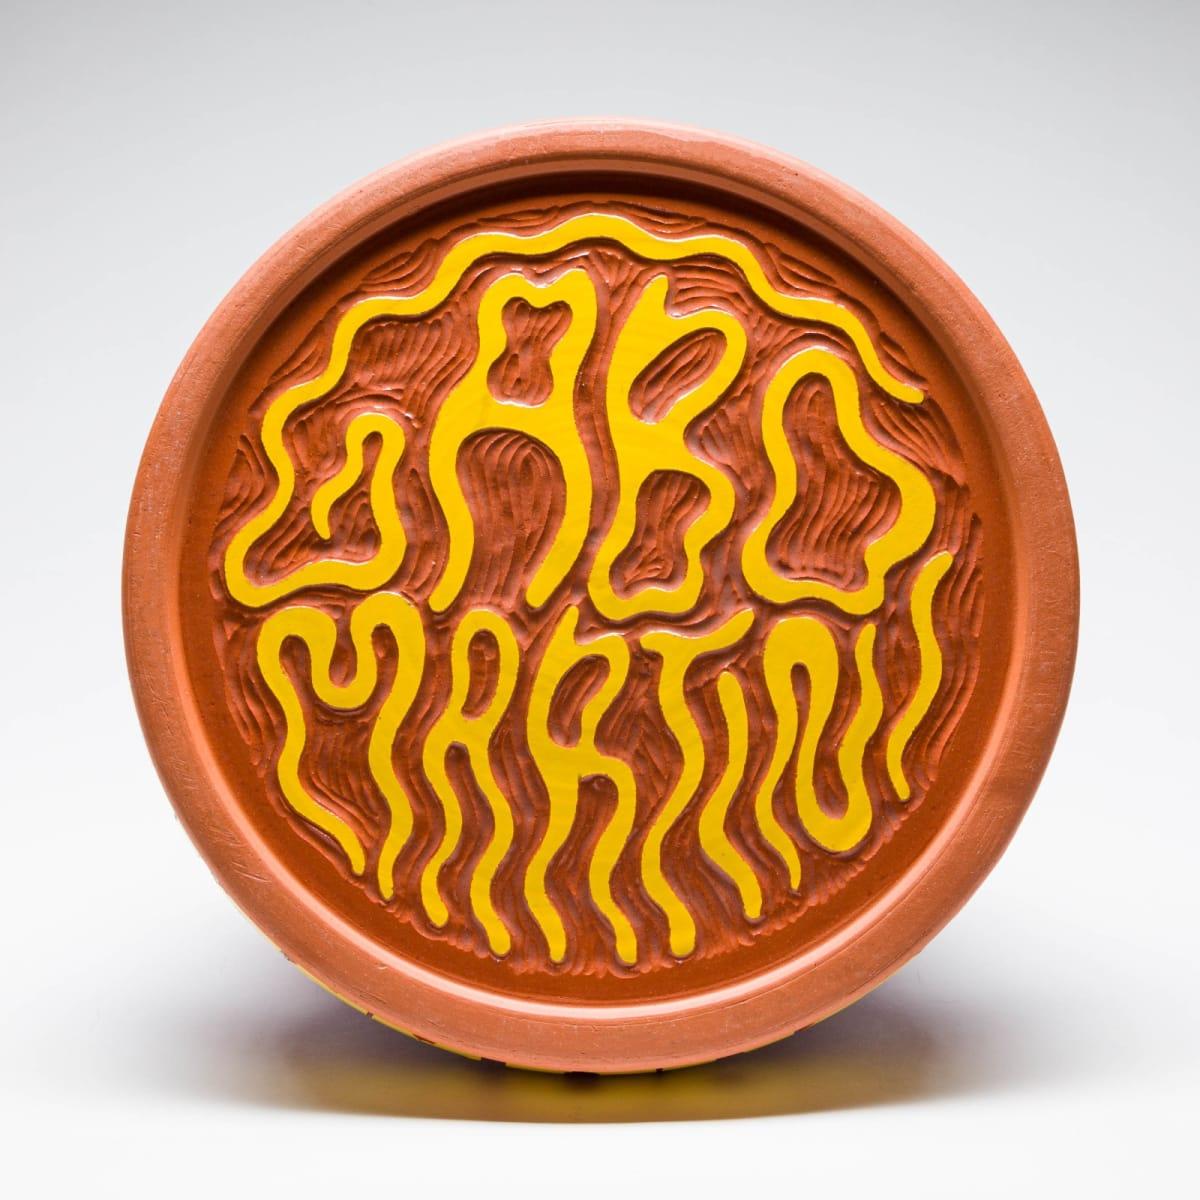 Gabo Martini Ceramics at Form & Concept Gallery